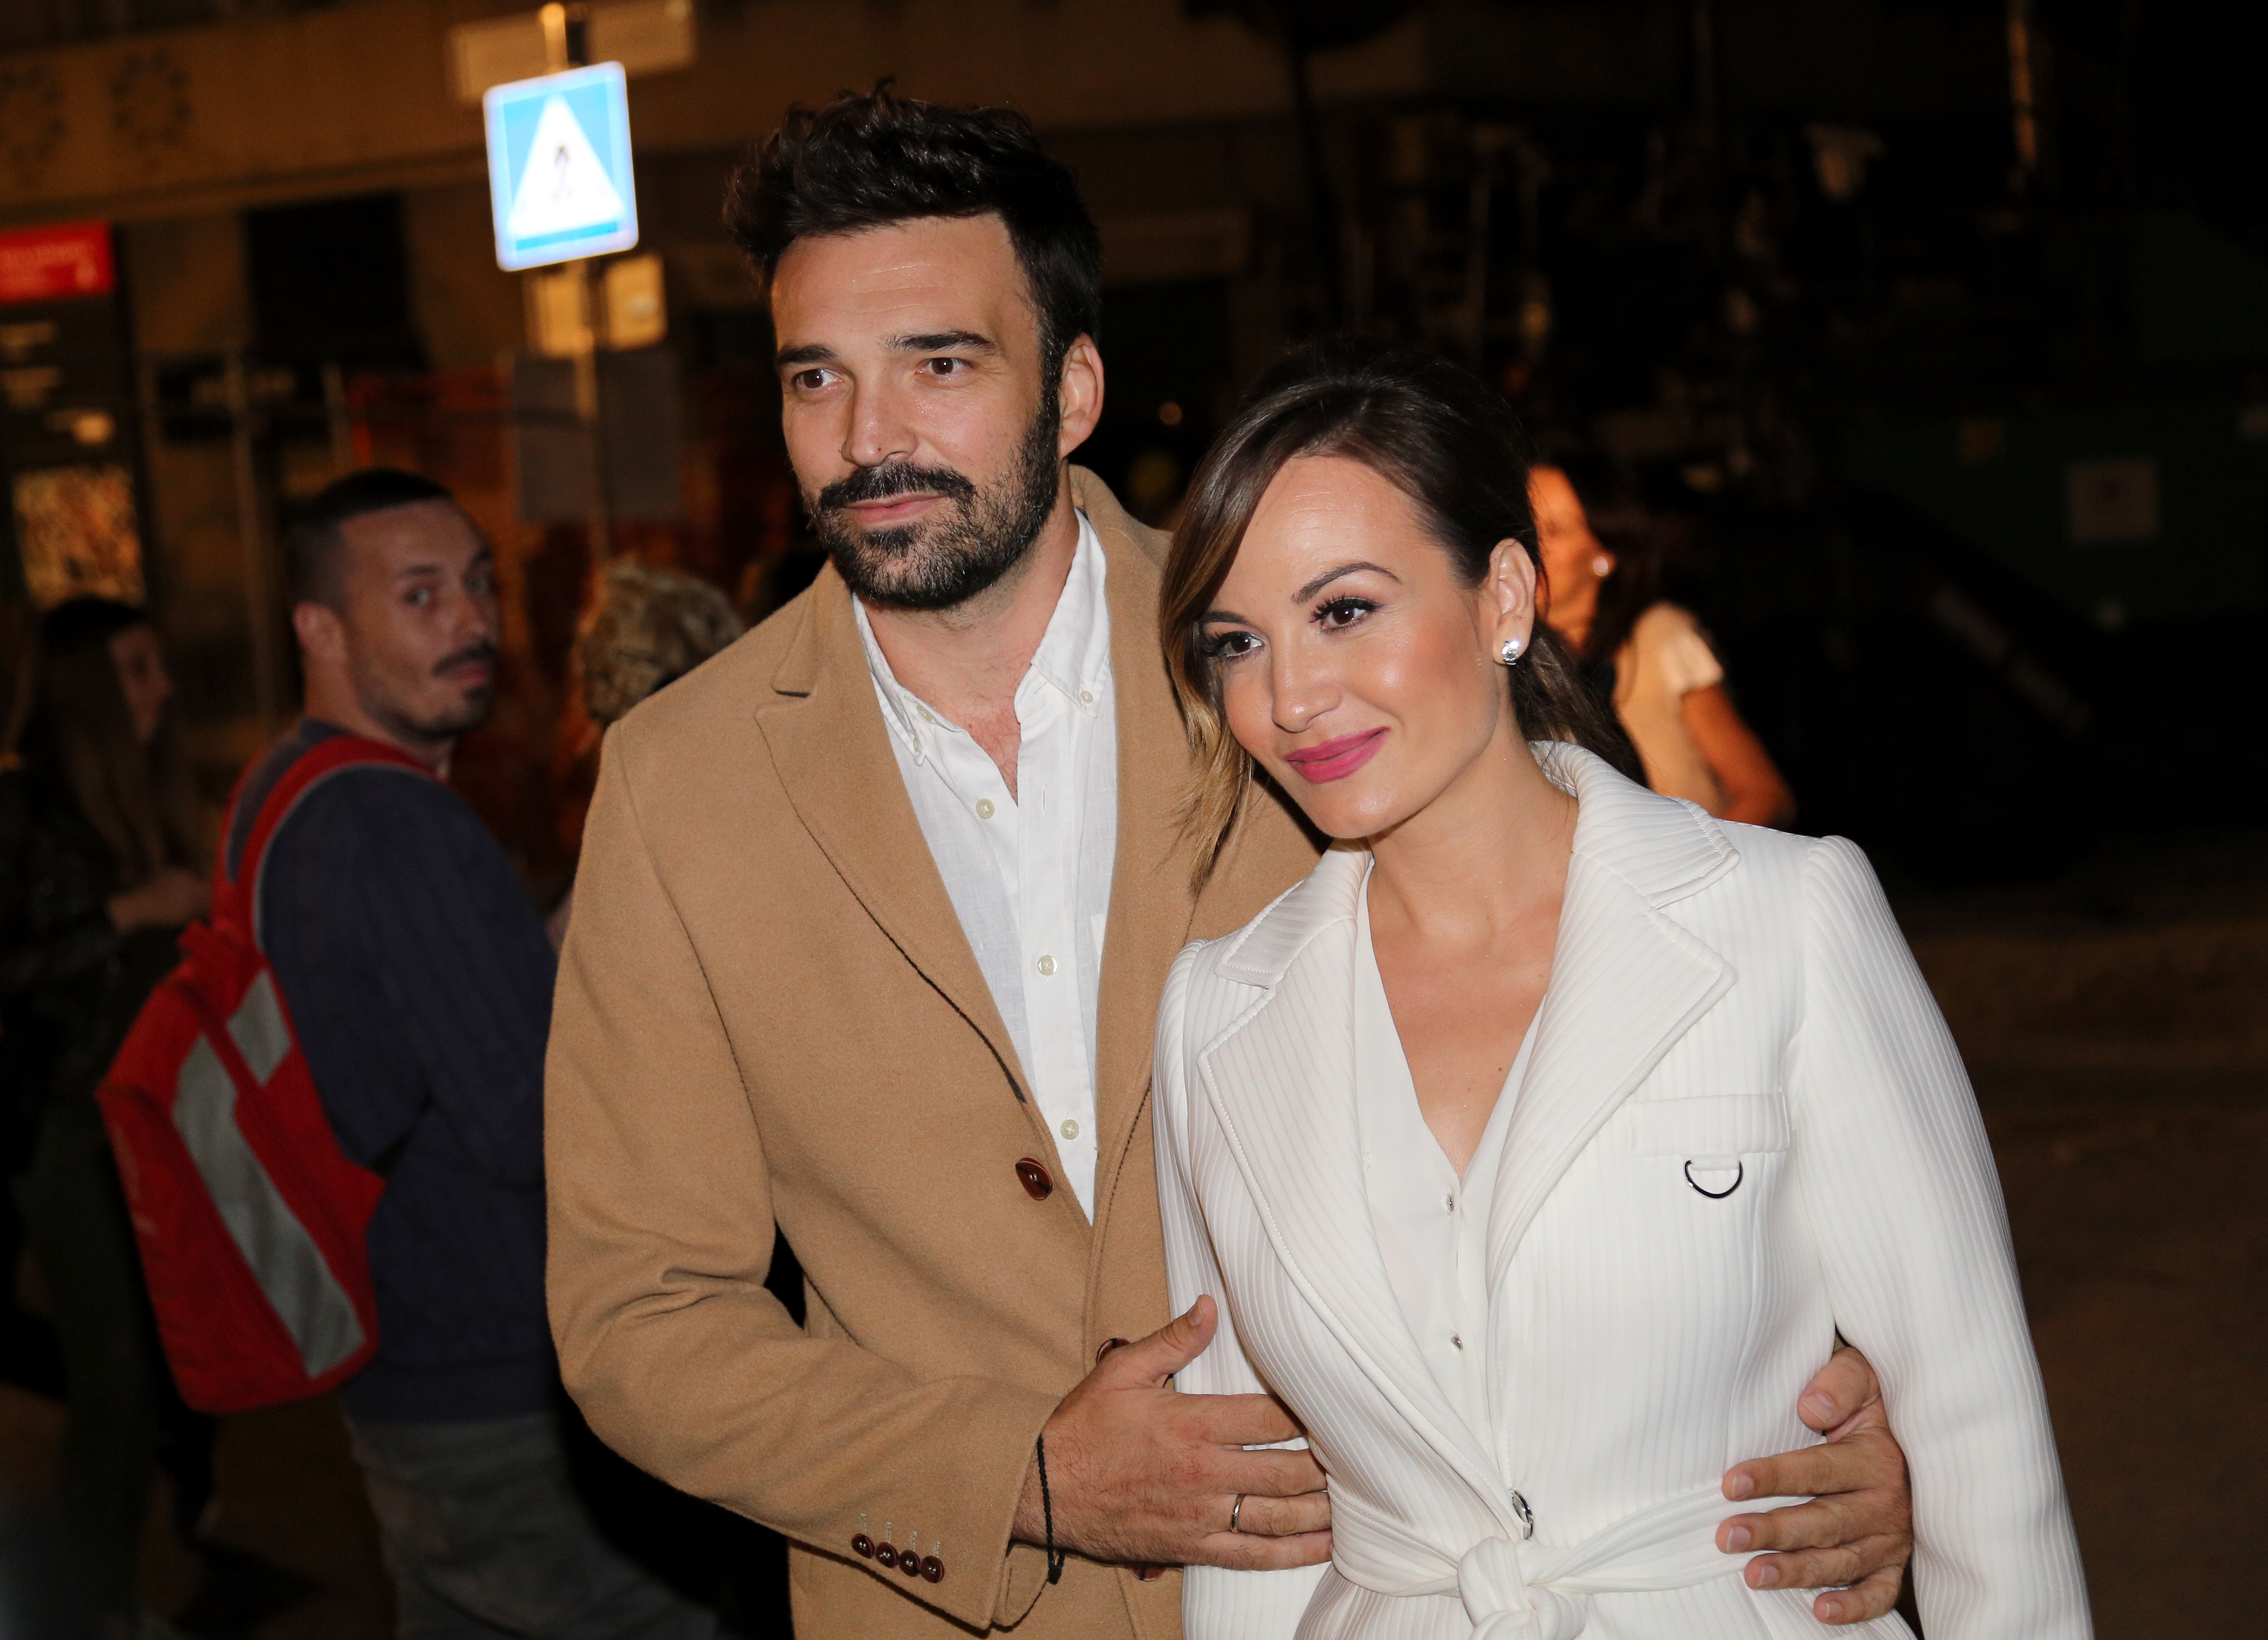 ŽENA ZA PRIMER! Jelena Tomašević suprugu IVANU posvetila OVE REČI! Objasnila je njihovu ljubav kroz nekoliko reči!